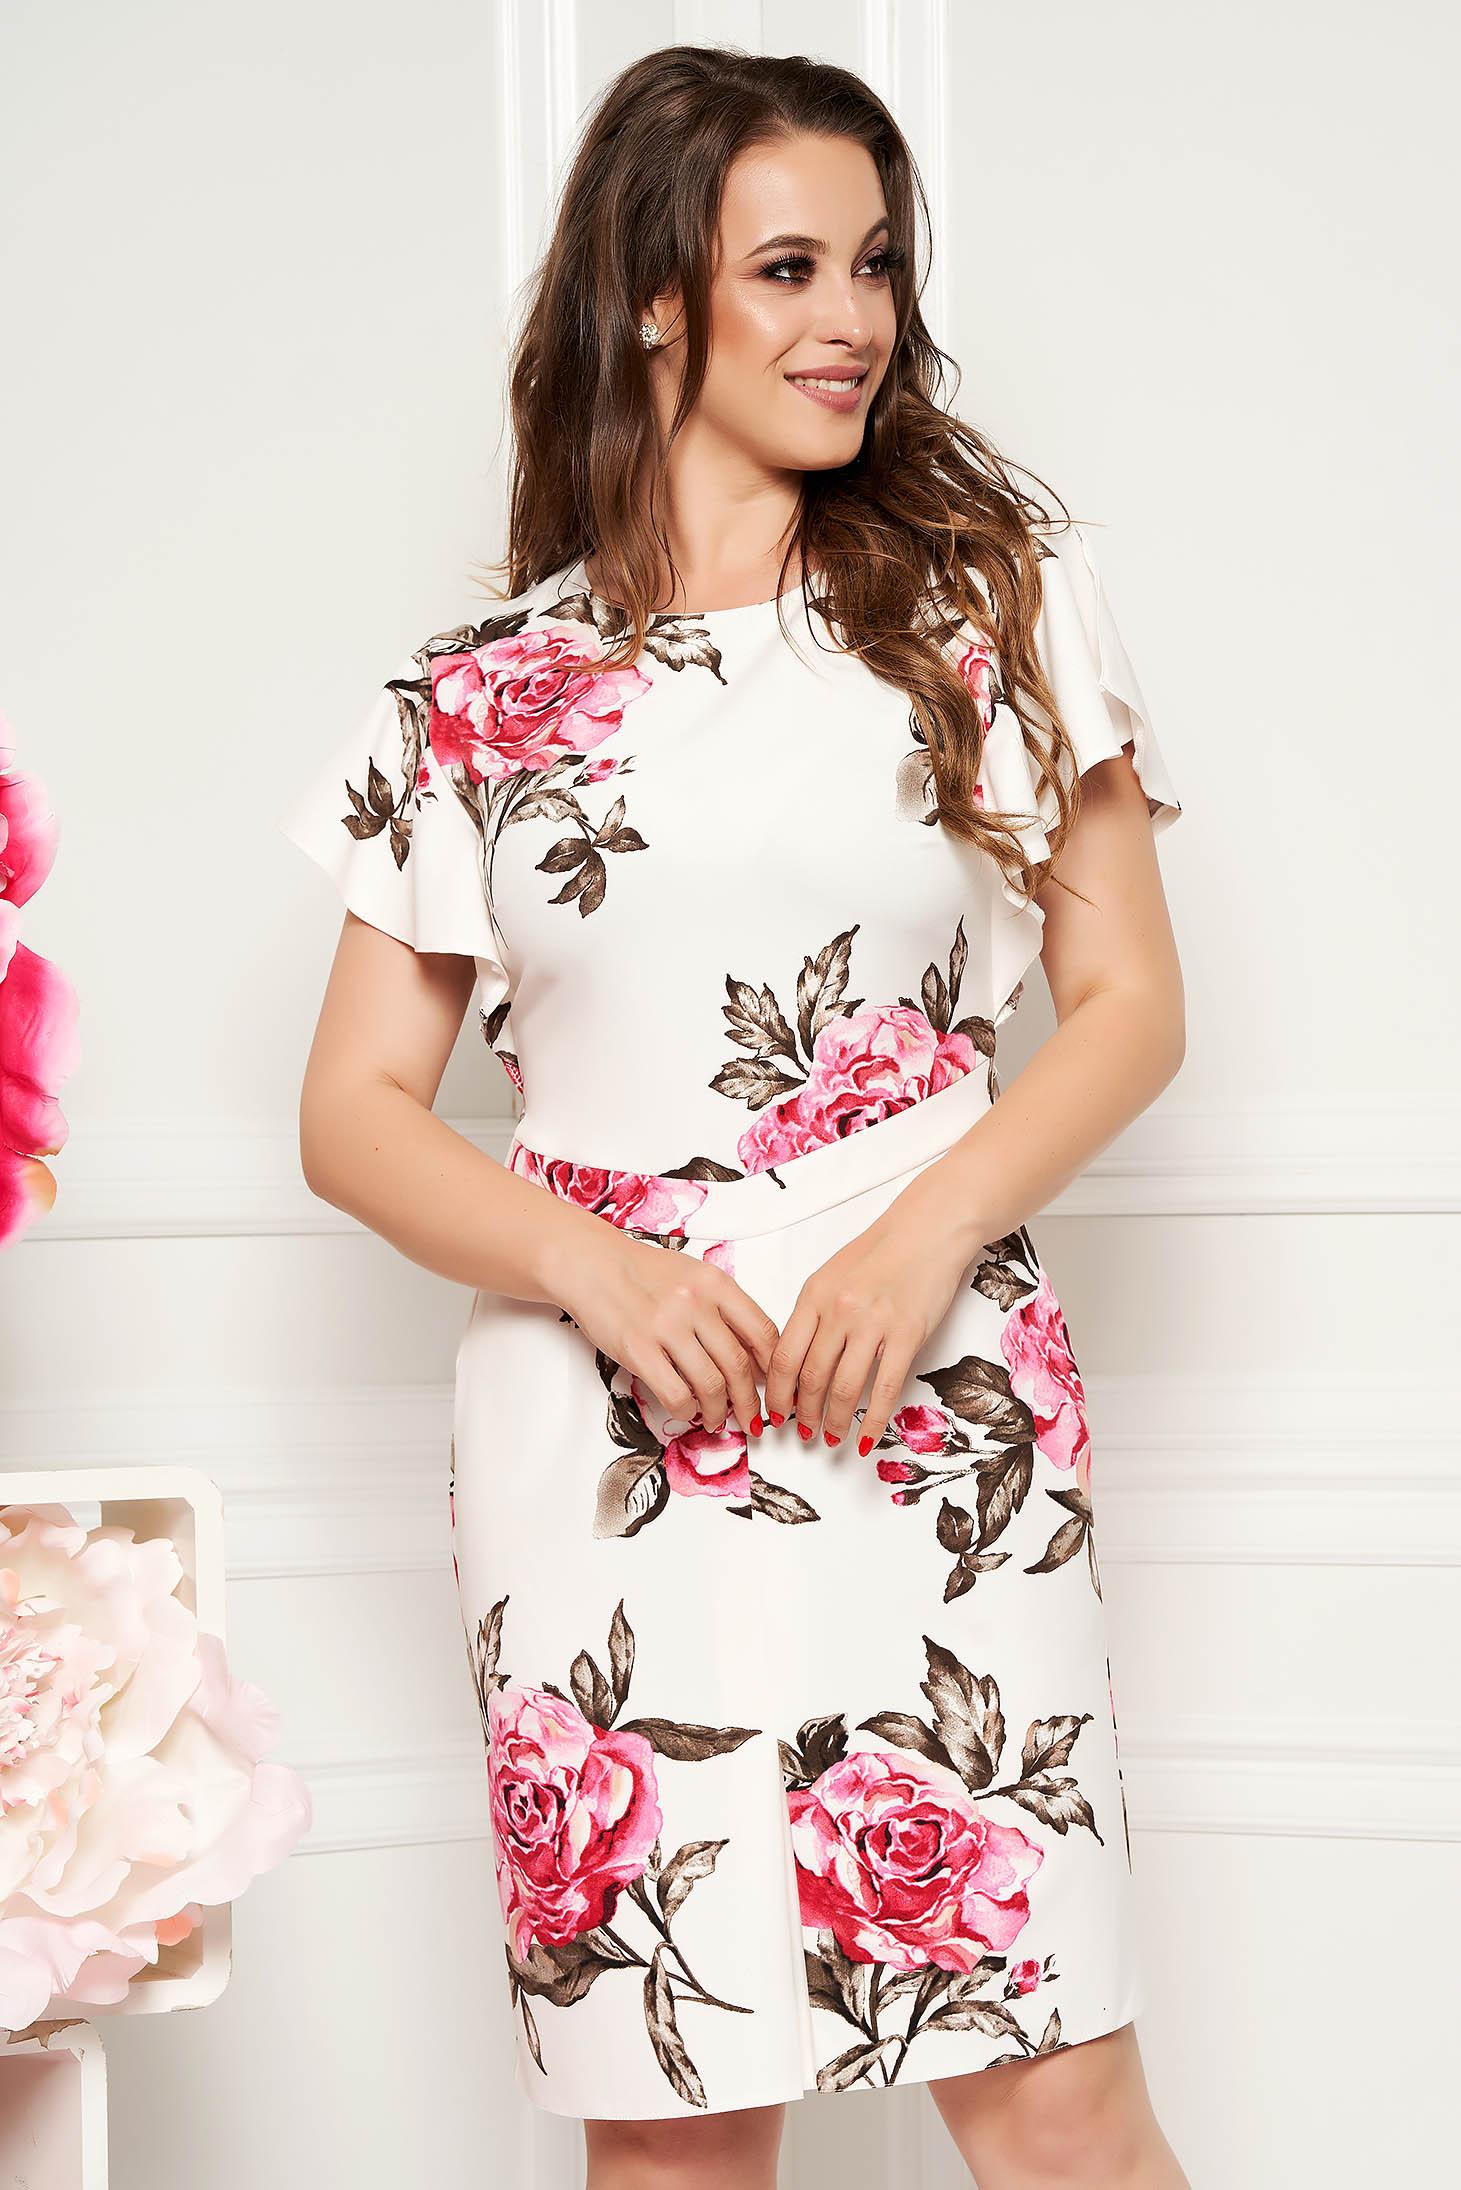 Rochie alba eleganta midi tip creion cu maneca scurta din material fin la atingere cu imprimeuri florale